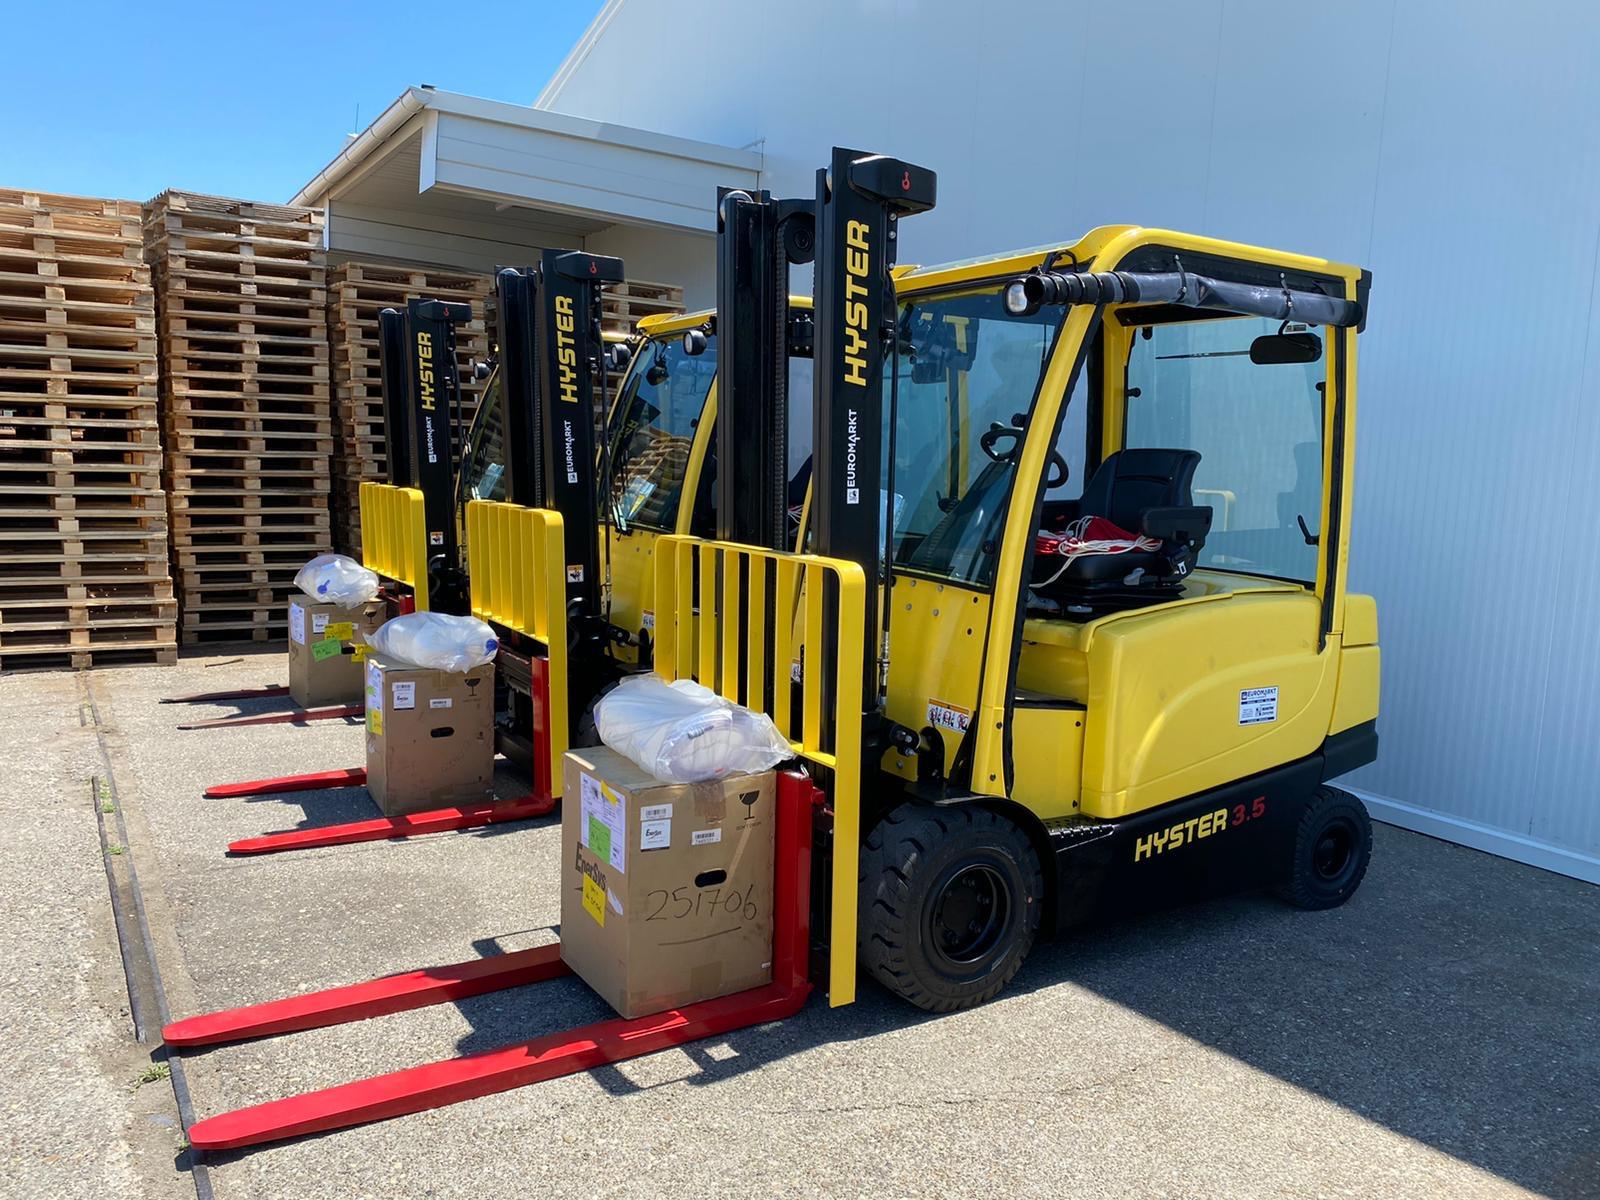 Tri nova čeona elektro viličara za klijenta iz drvne industrije